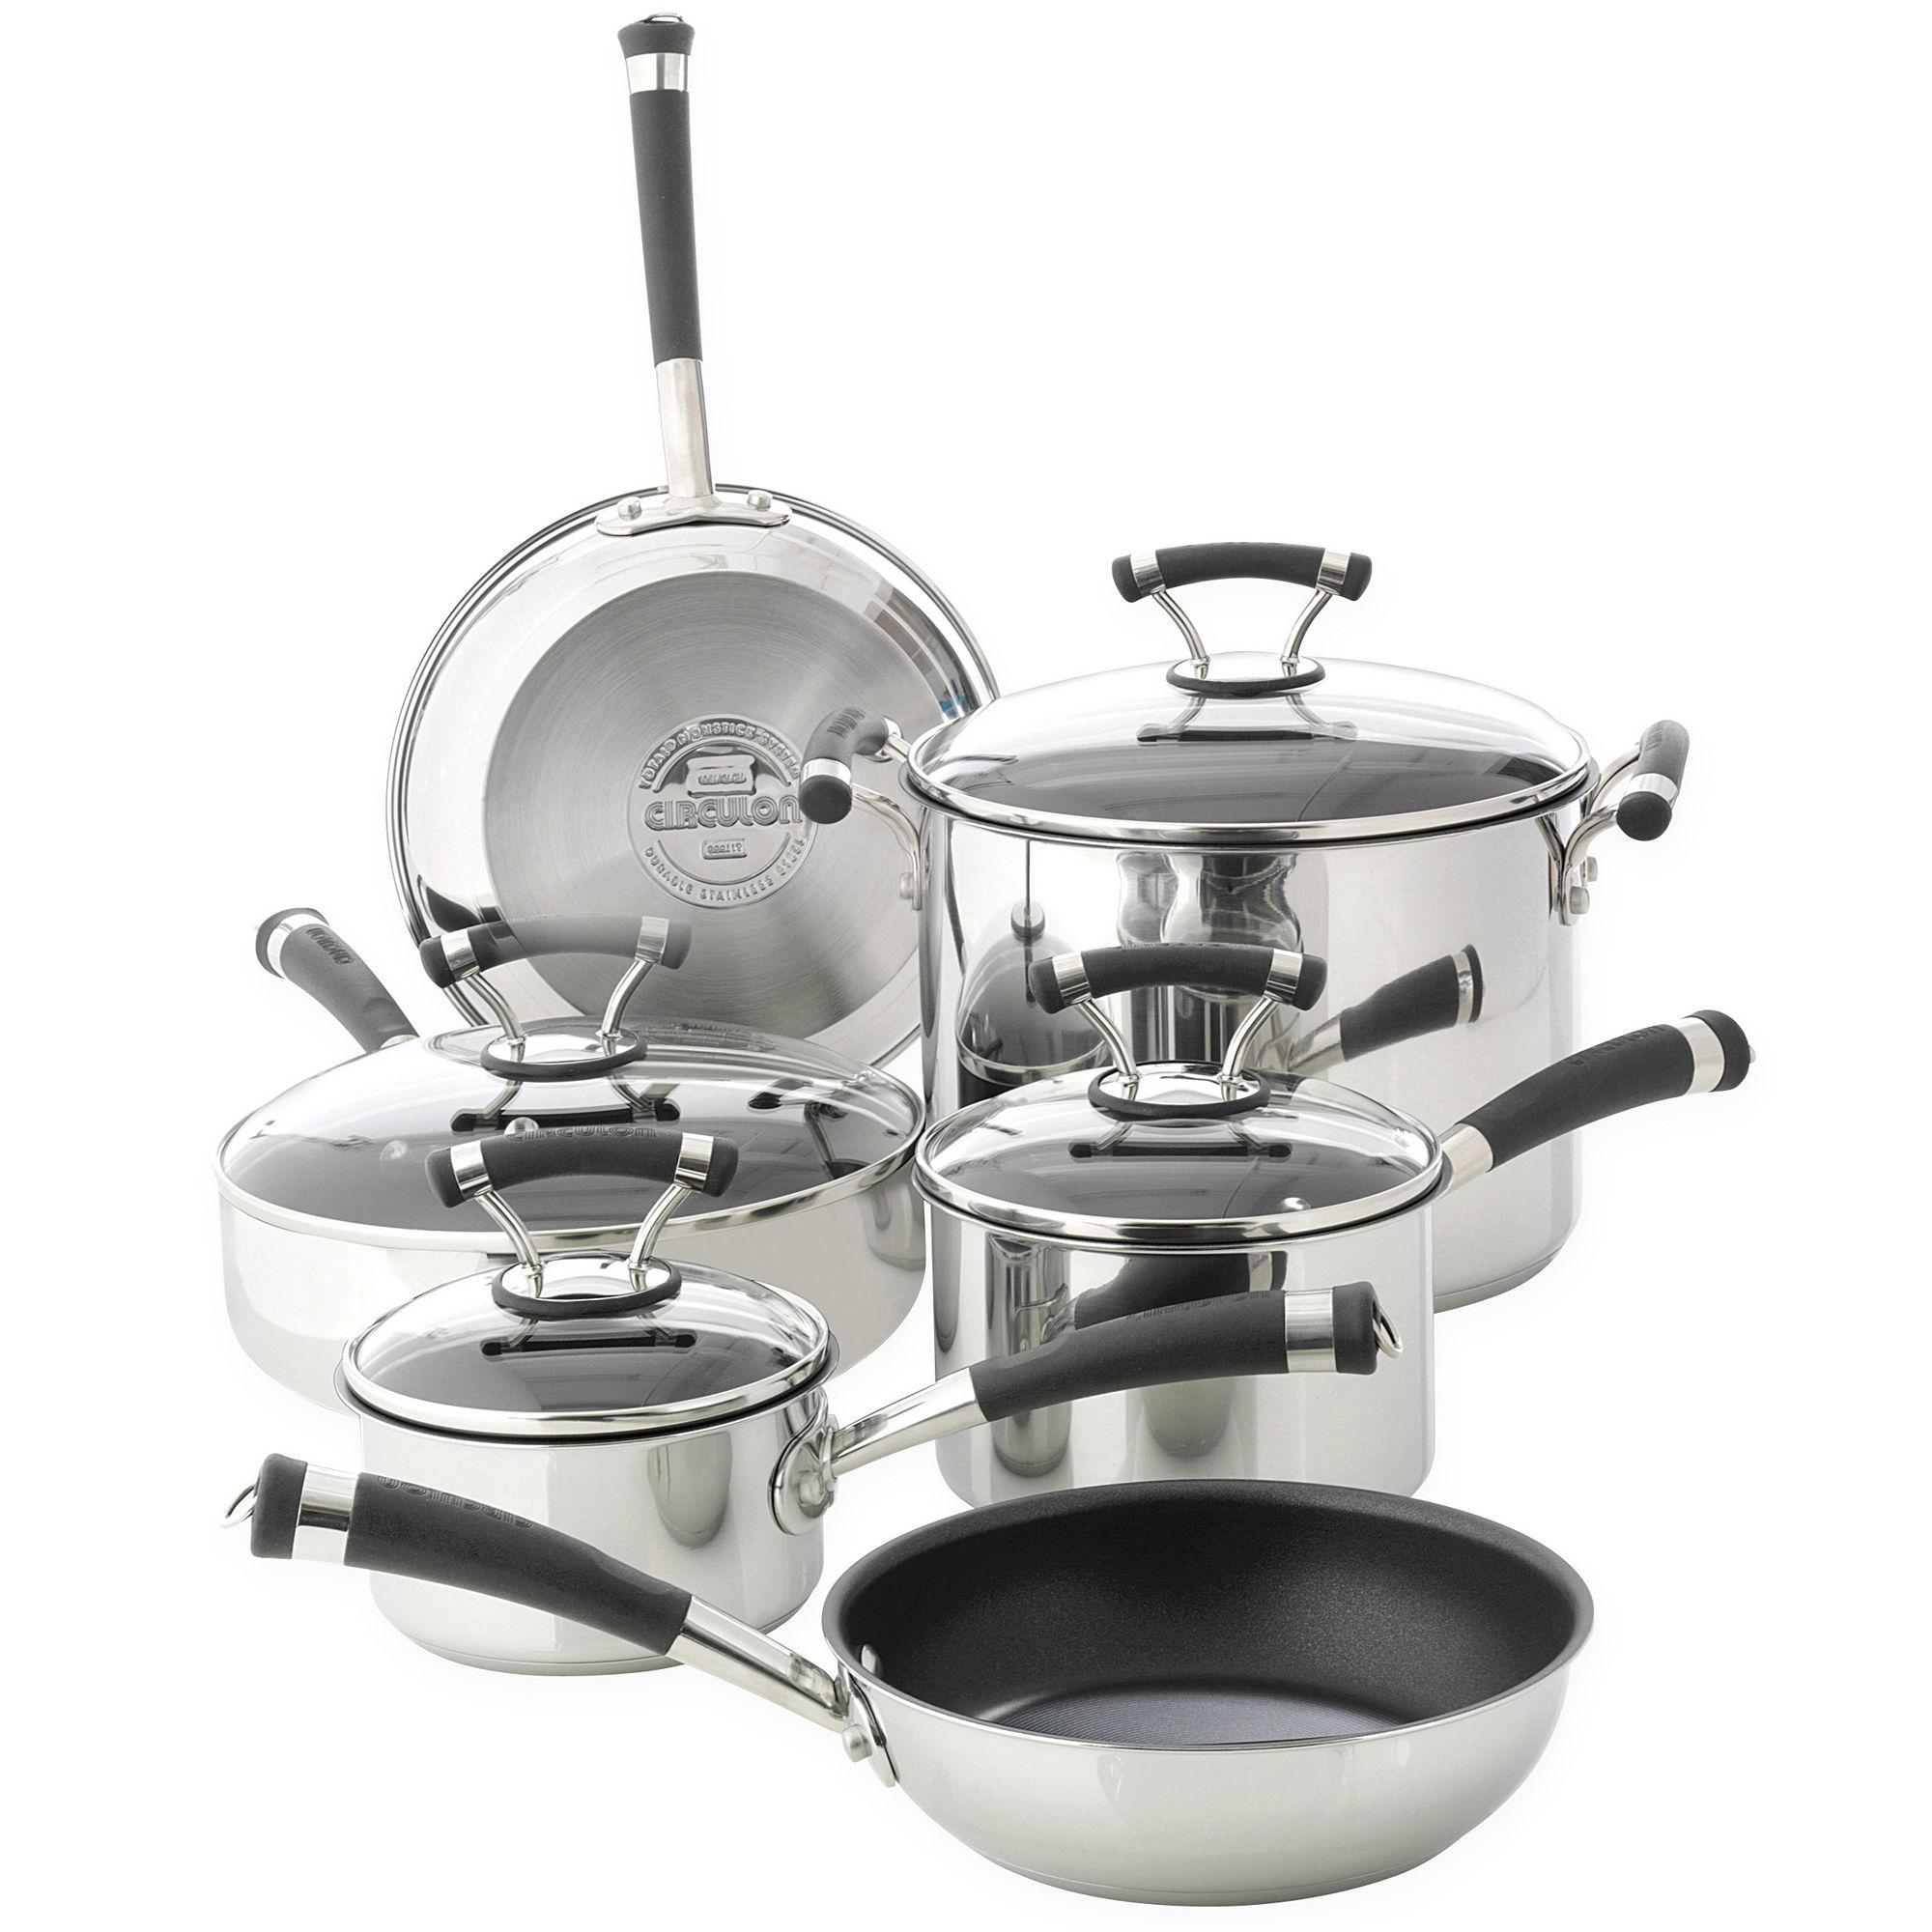 Cheap circulon 10 pc stainless steel cookware set bonus for Harga kitchen set stainless per meter